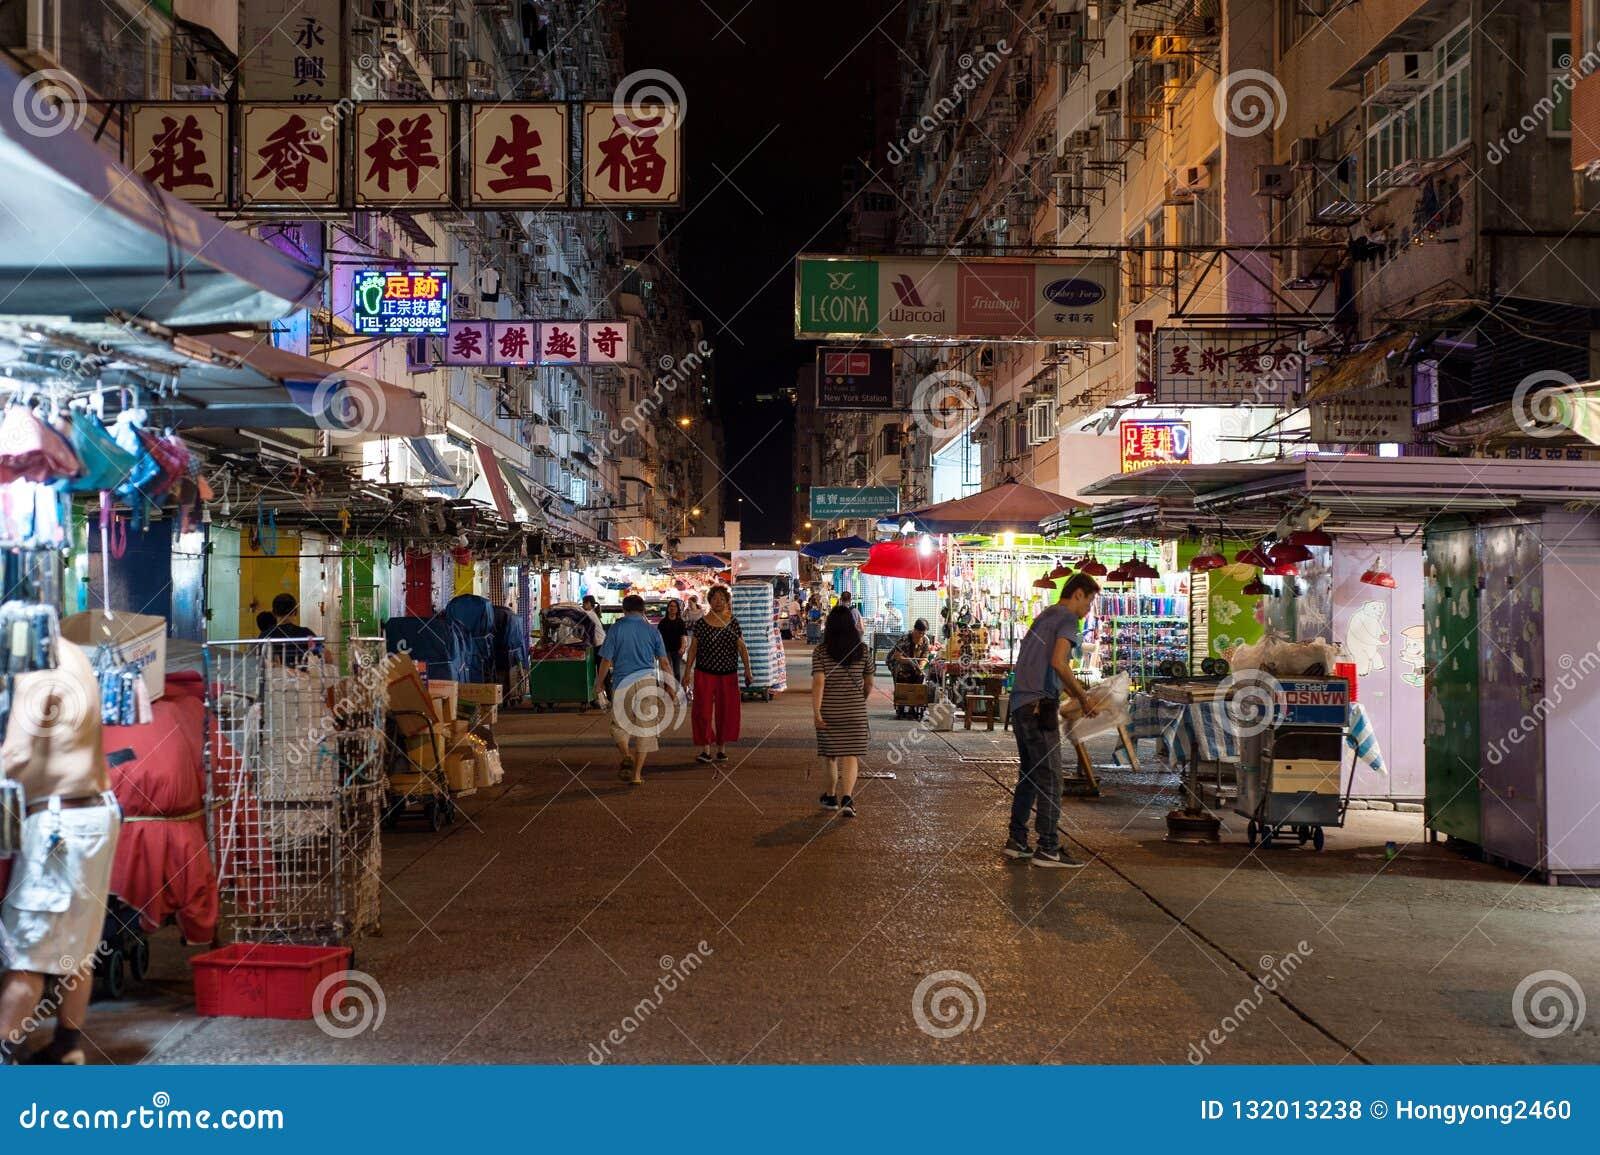 Hong Kong Sneaker Street Closing